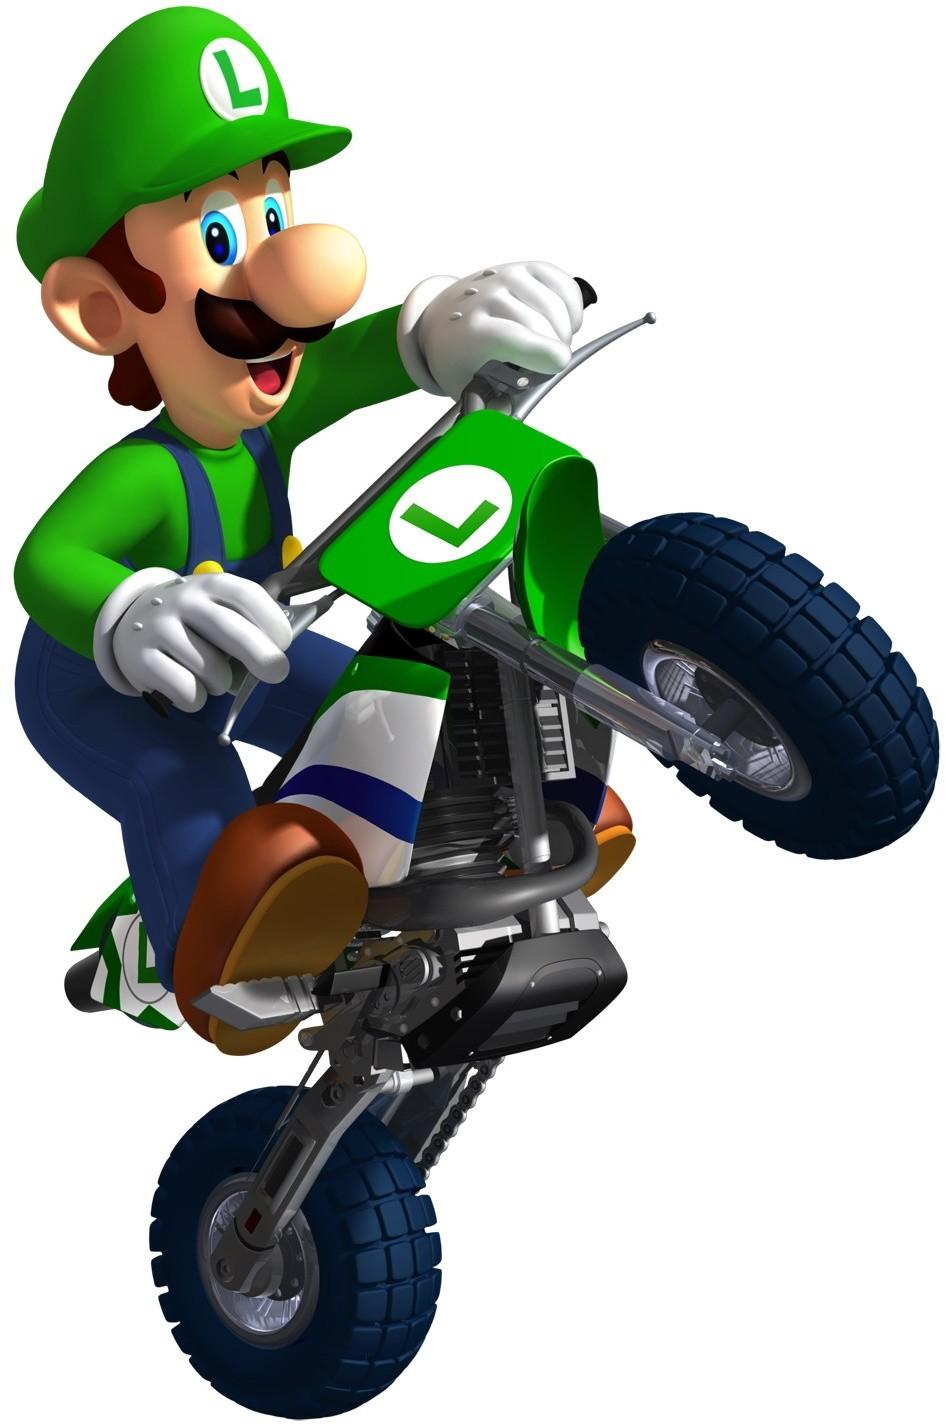 Luigi the mario kart racing wiki mario kart mario kart ds mario kart 64 and more - Mario kart wii voiture ...